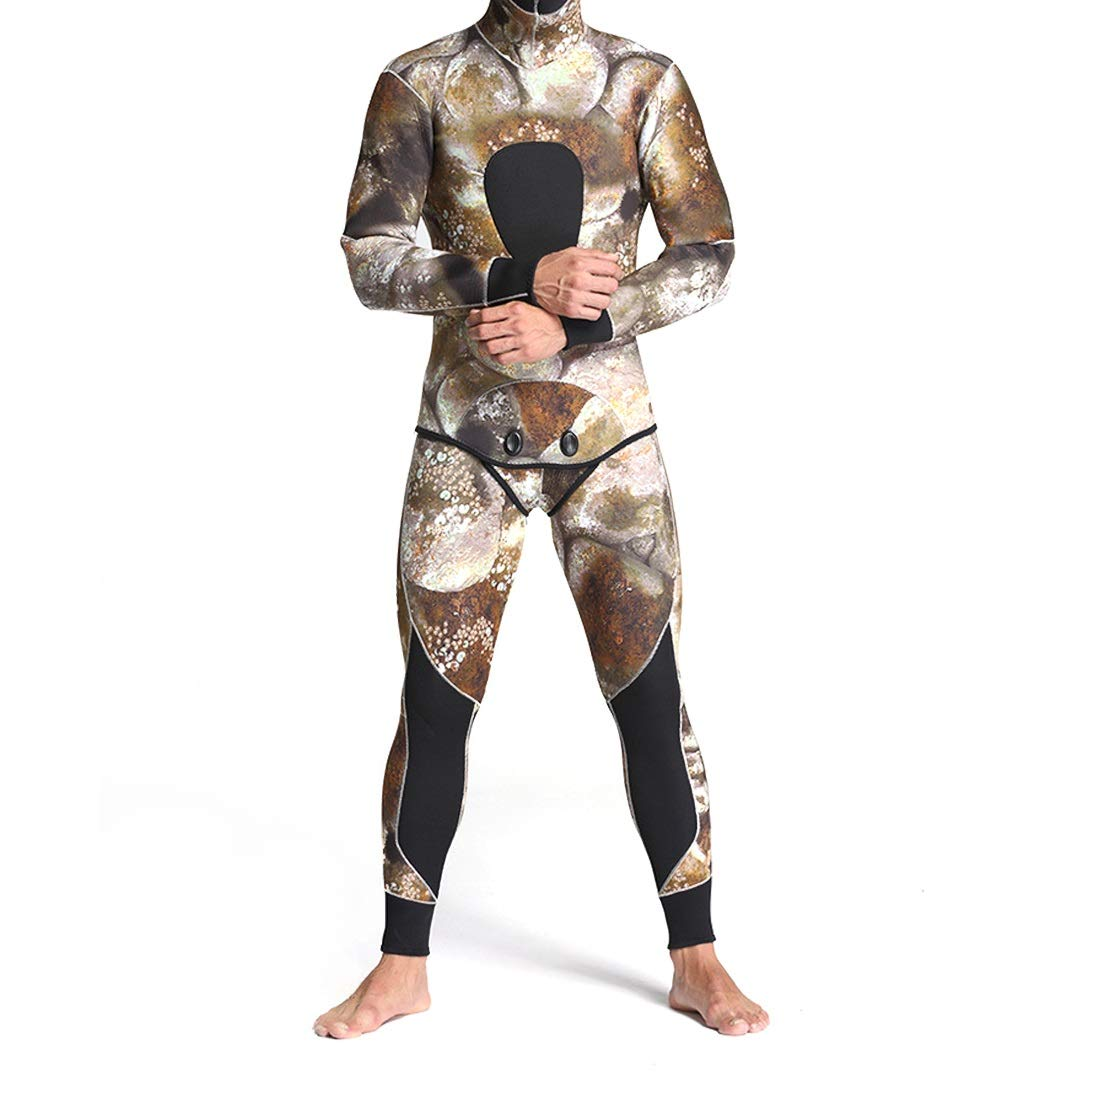 CeSuoLiBengDi ウェットスーツ Medium メンズ サイズ 水着 ダイビング サーフィン Medium|1 迷彩服 日焼け止め 吸汗速乾 防寒 保温性優れる 長袖 (Color : 2, サイズ : M) B07G77J1JN Medium|1 1 Medium, 色見本のG&E:1046139a --- sharoshka.org